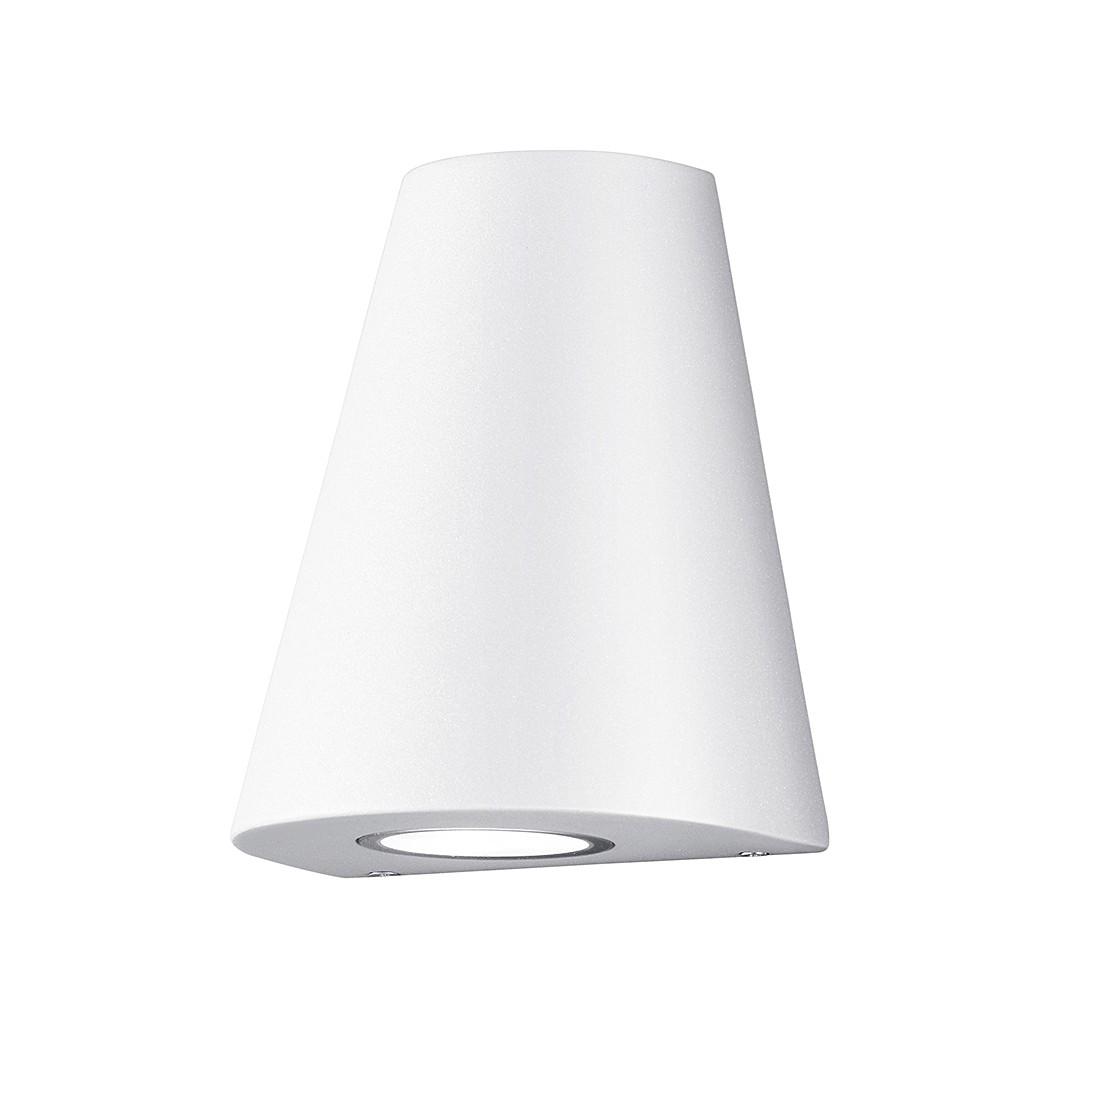 EEK A+, LED-Außenleuchte Niagara 4-flammig - Aluminium Kunststoff - Silber, Trio